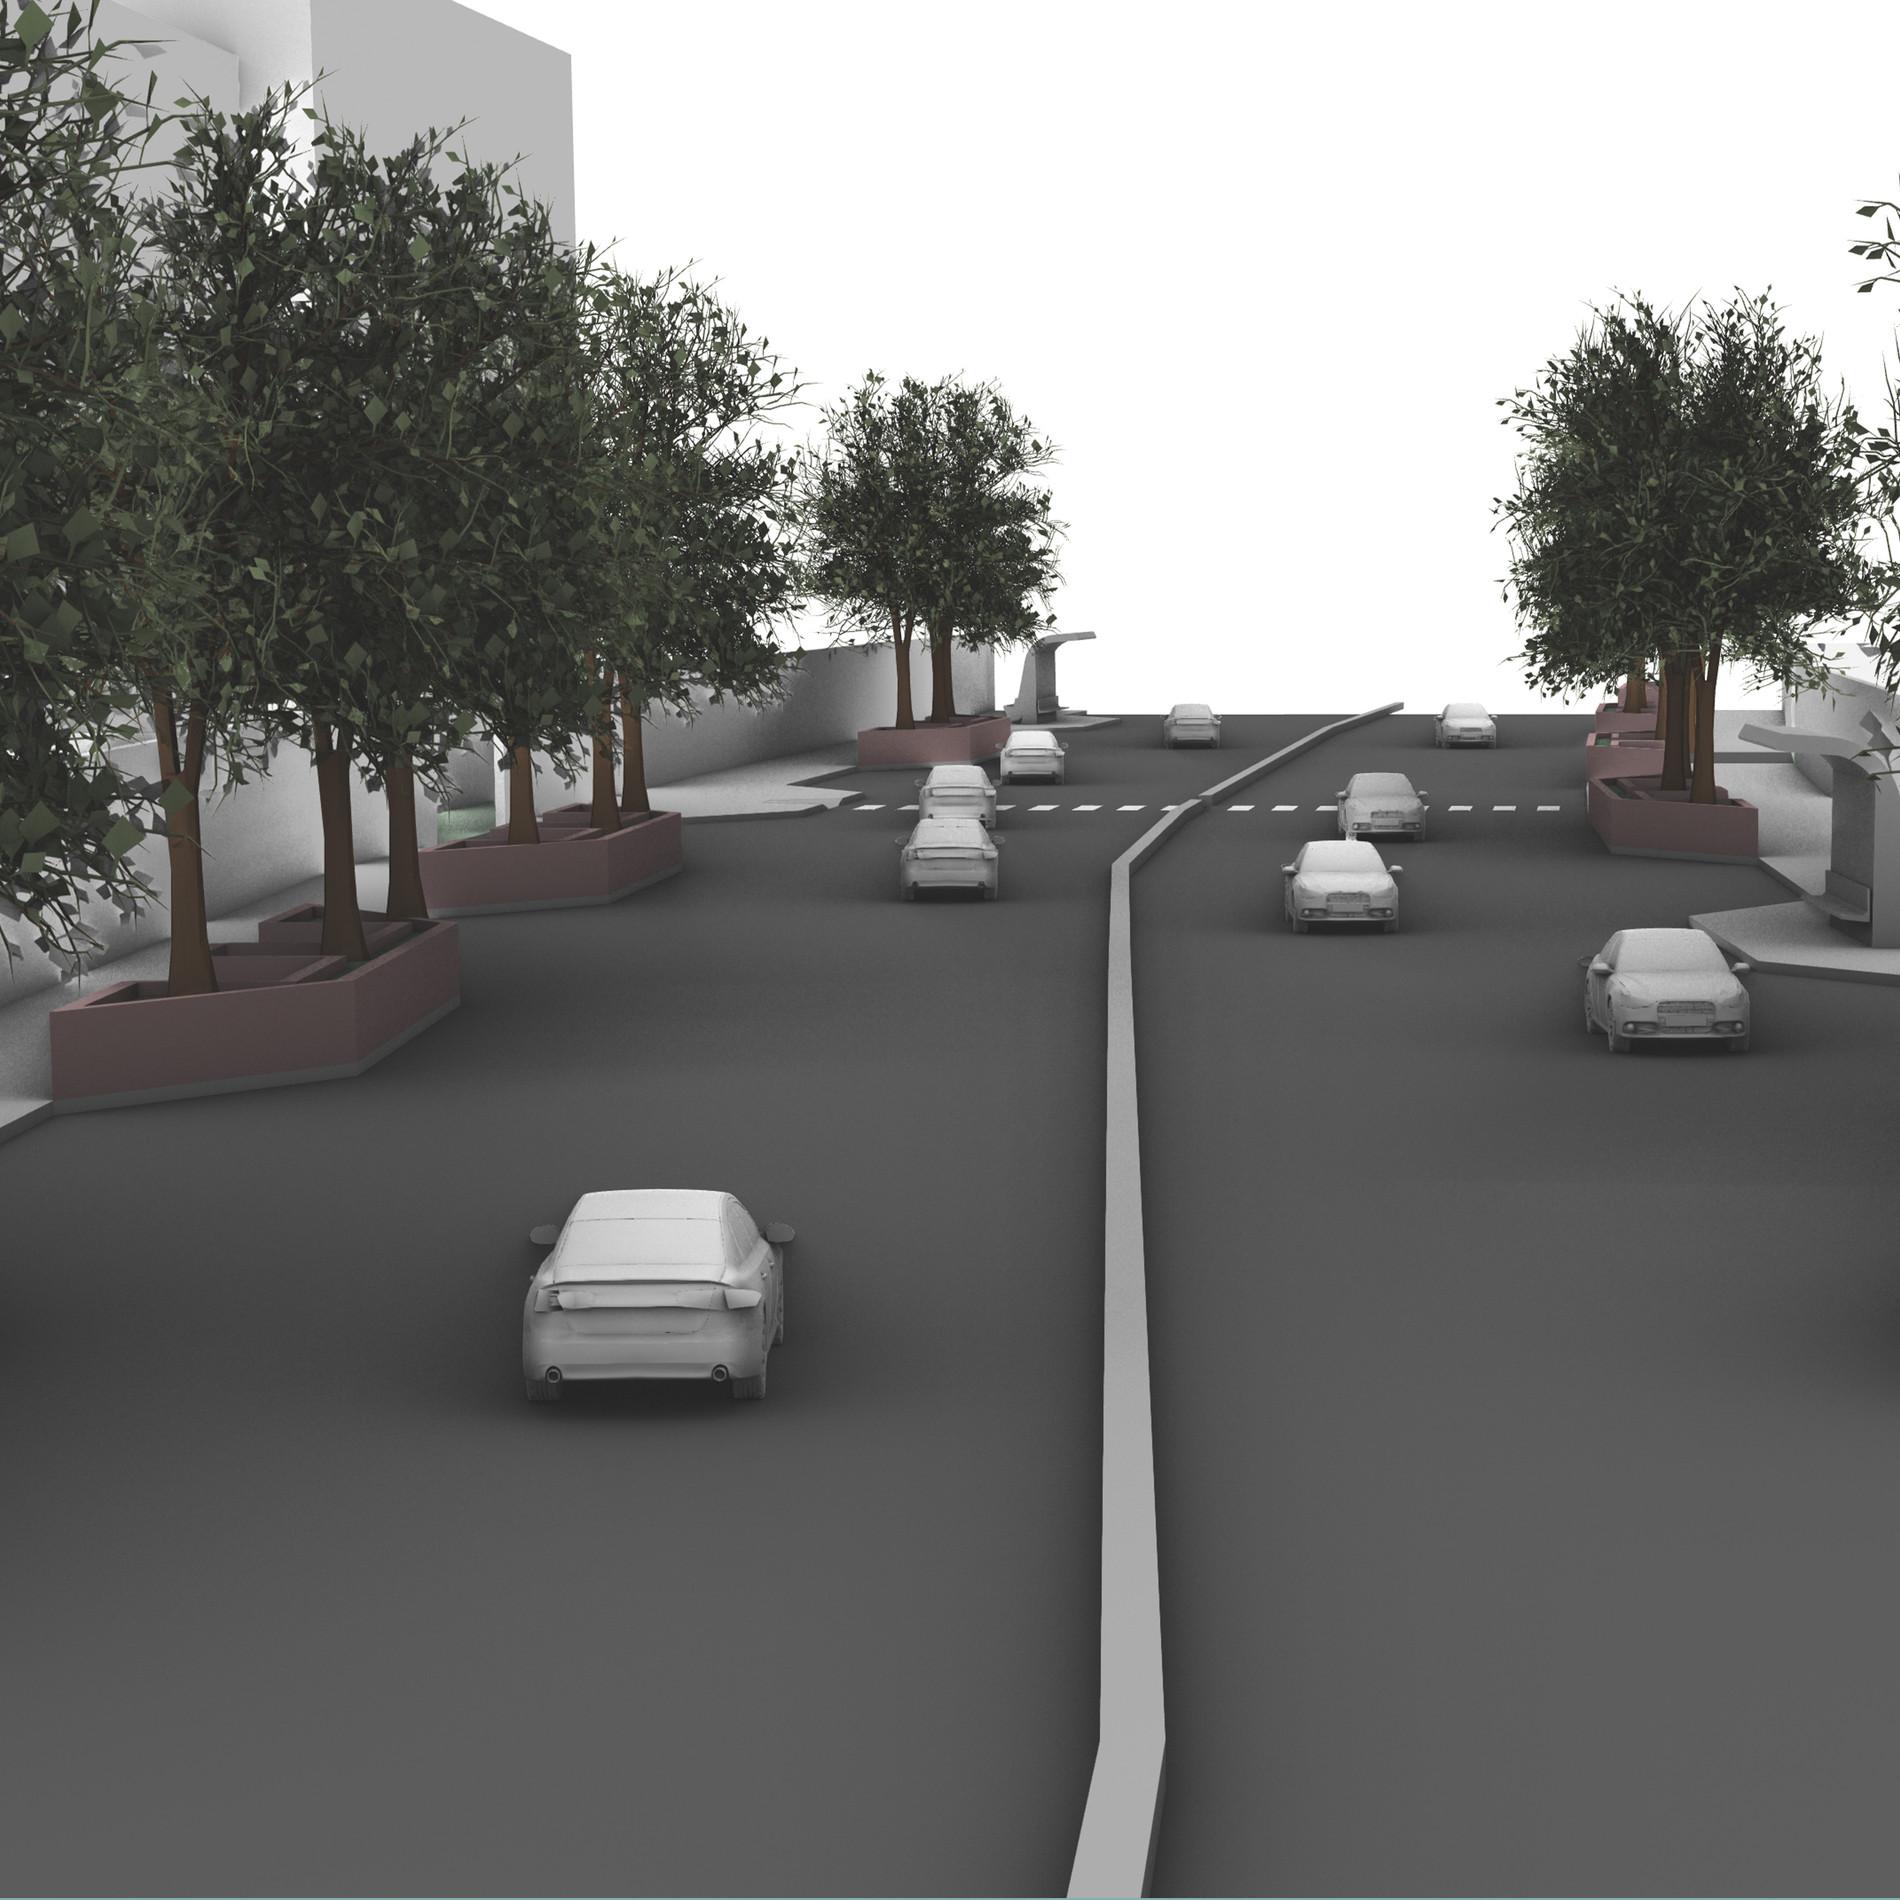 Rethinking the Sidewalk